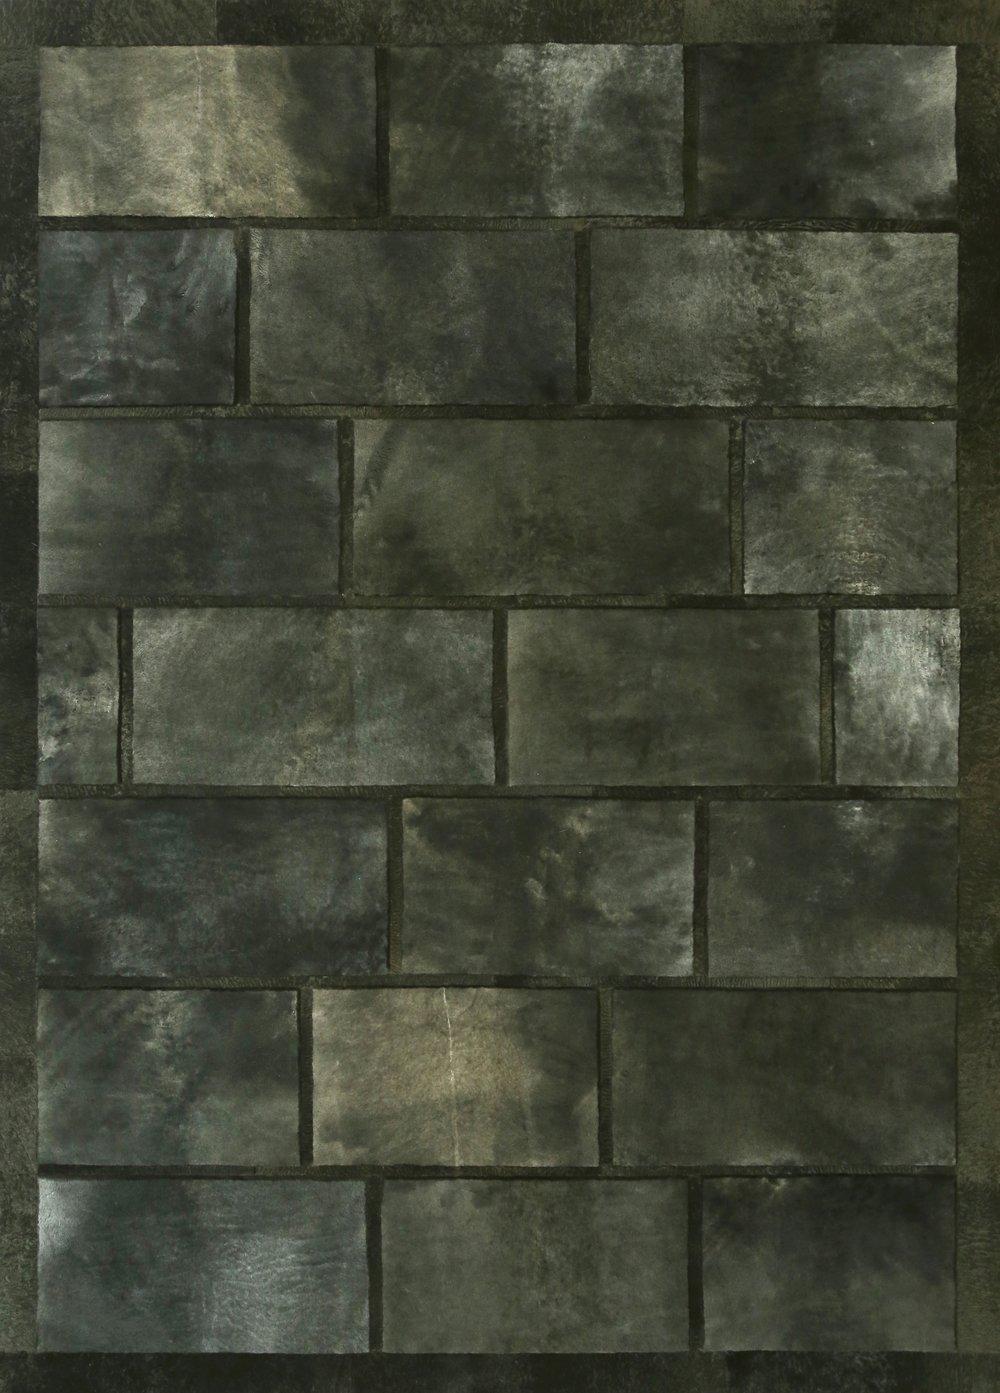 ANKA 'MUTON' (K 44-AST 44) (13).jpg